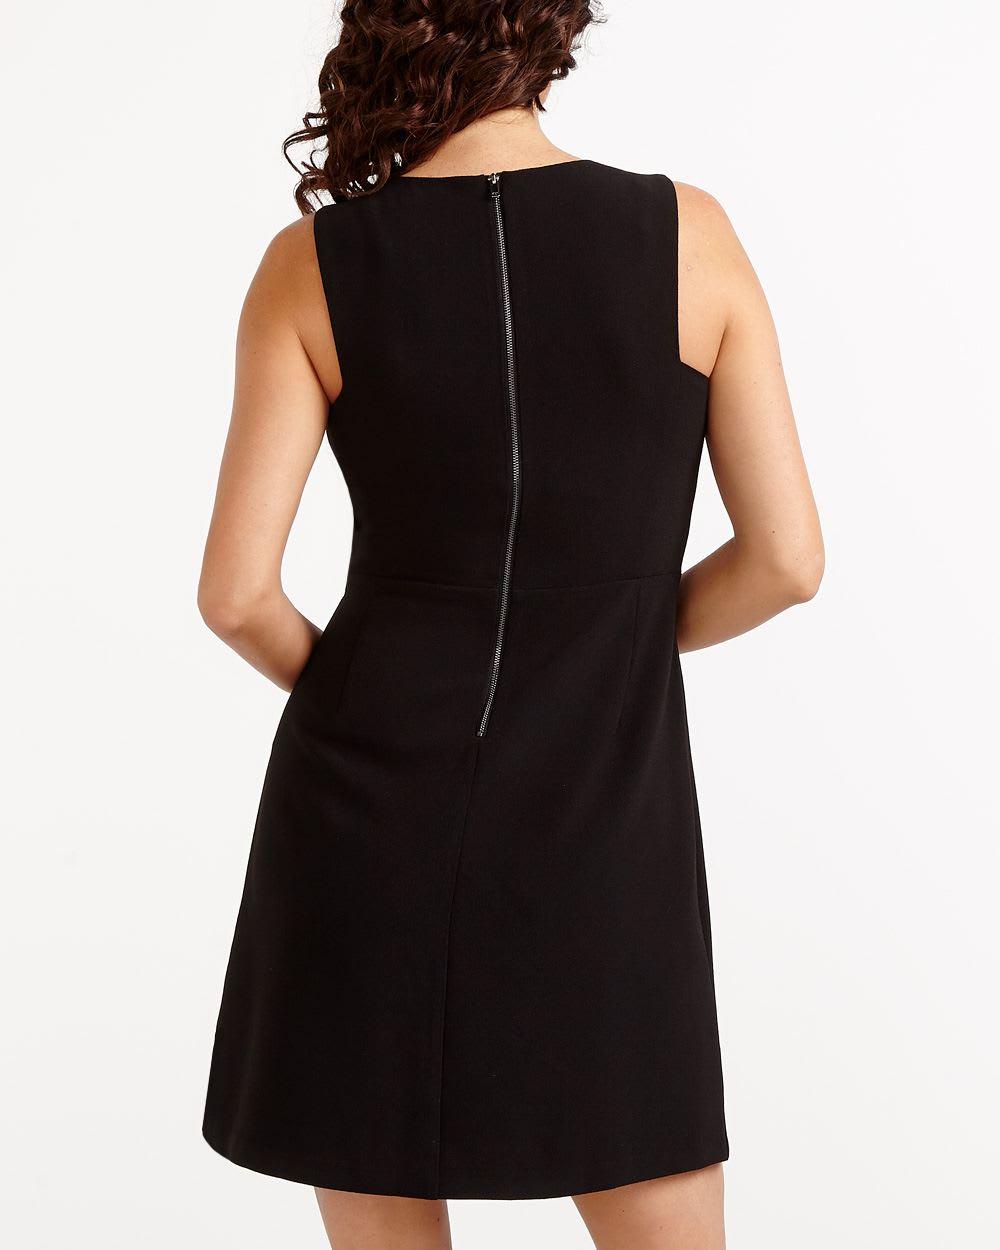 a705237075bfb3 Sleeveless Dress